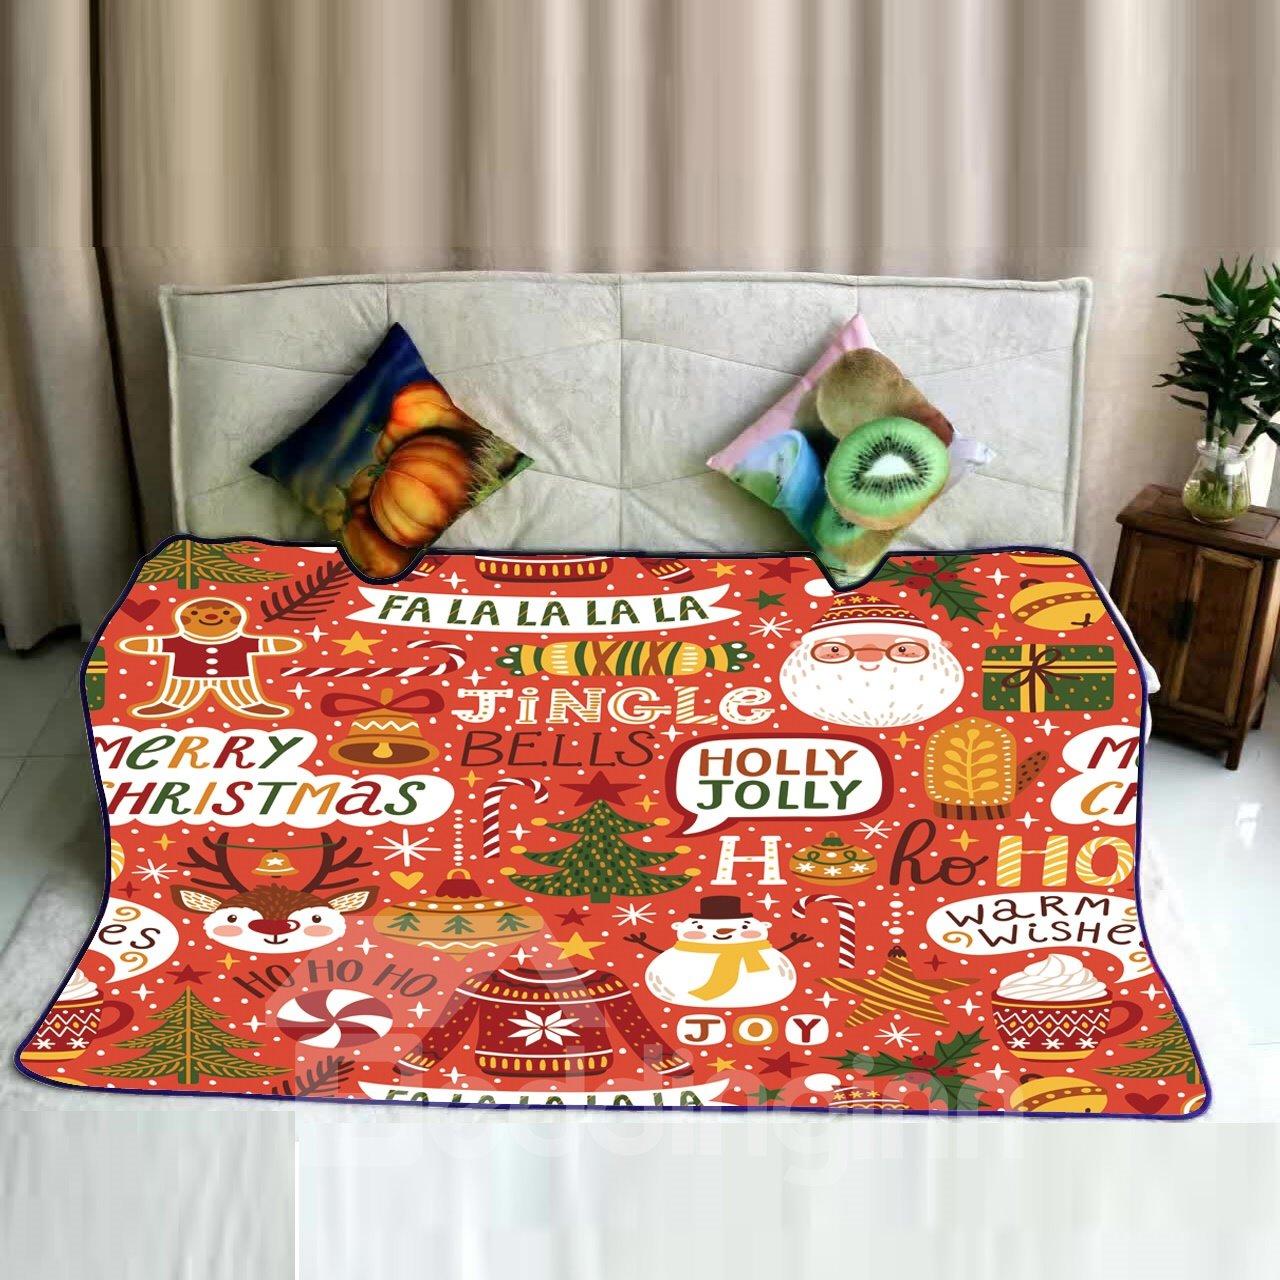 Merry Christmas Jingle Bells Celebration Pattern Flannel Bed Blankets